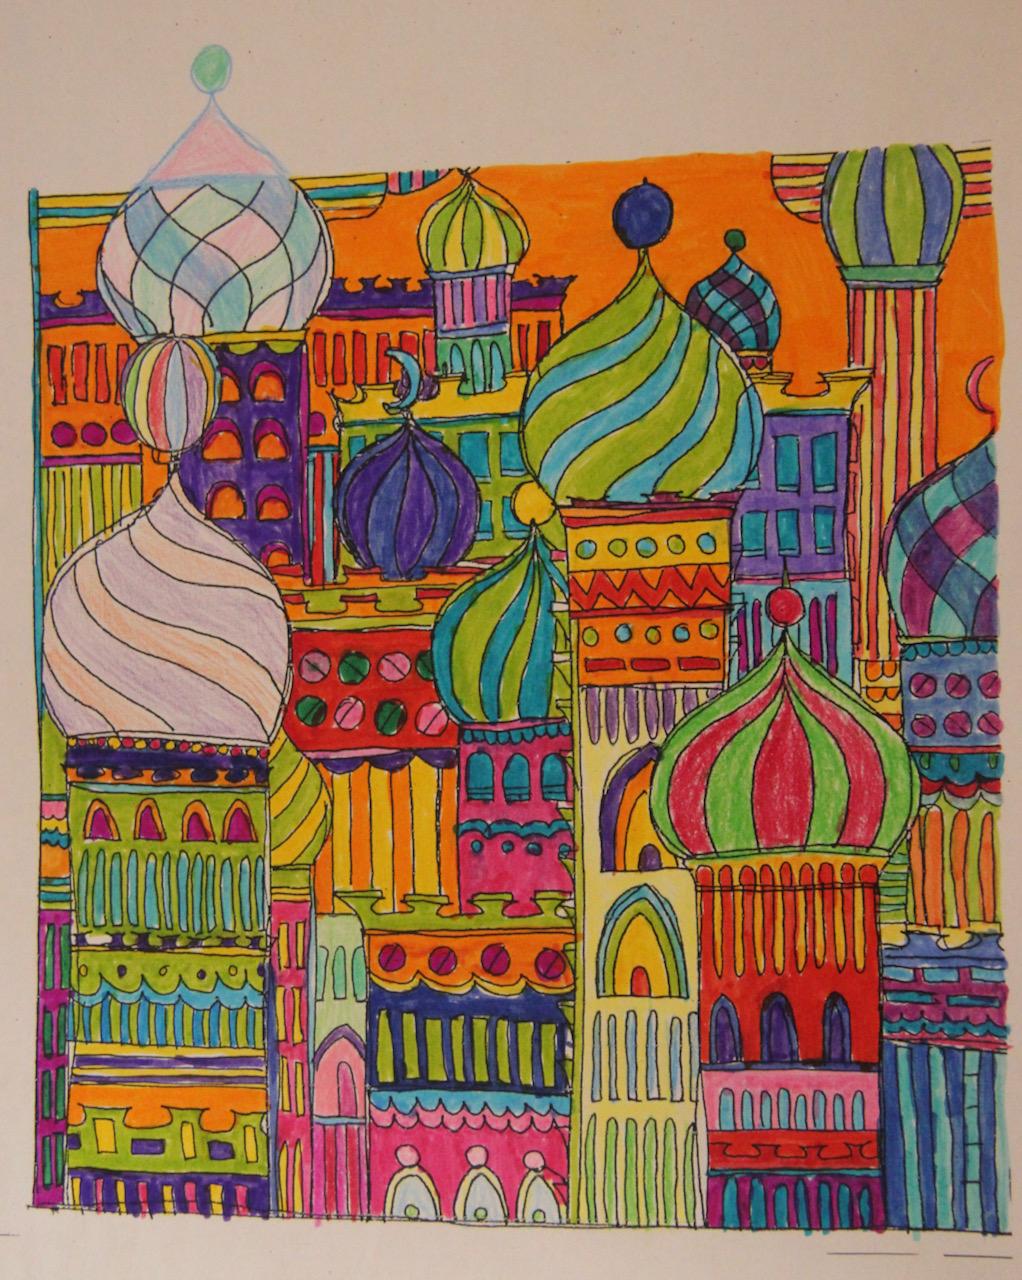 Hundertwasser-style-onion-domes